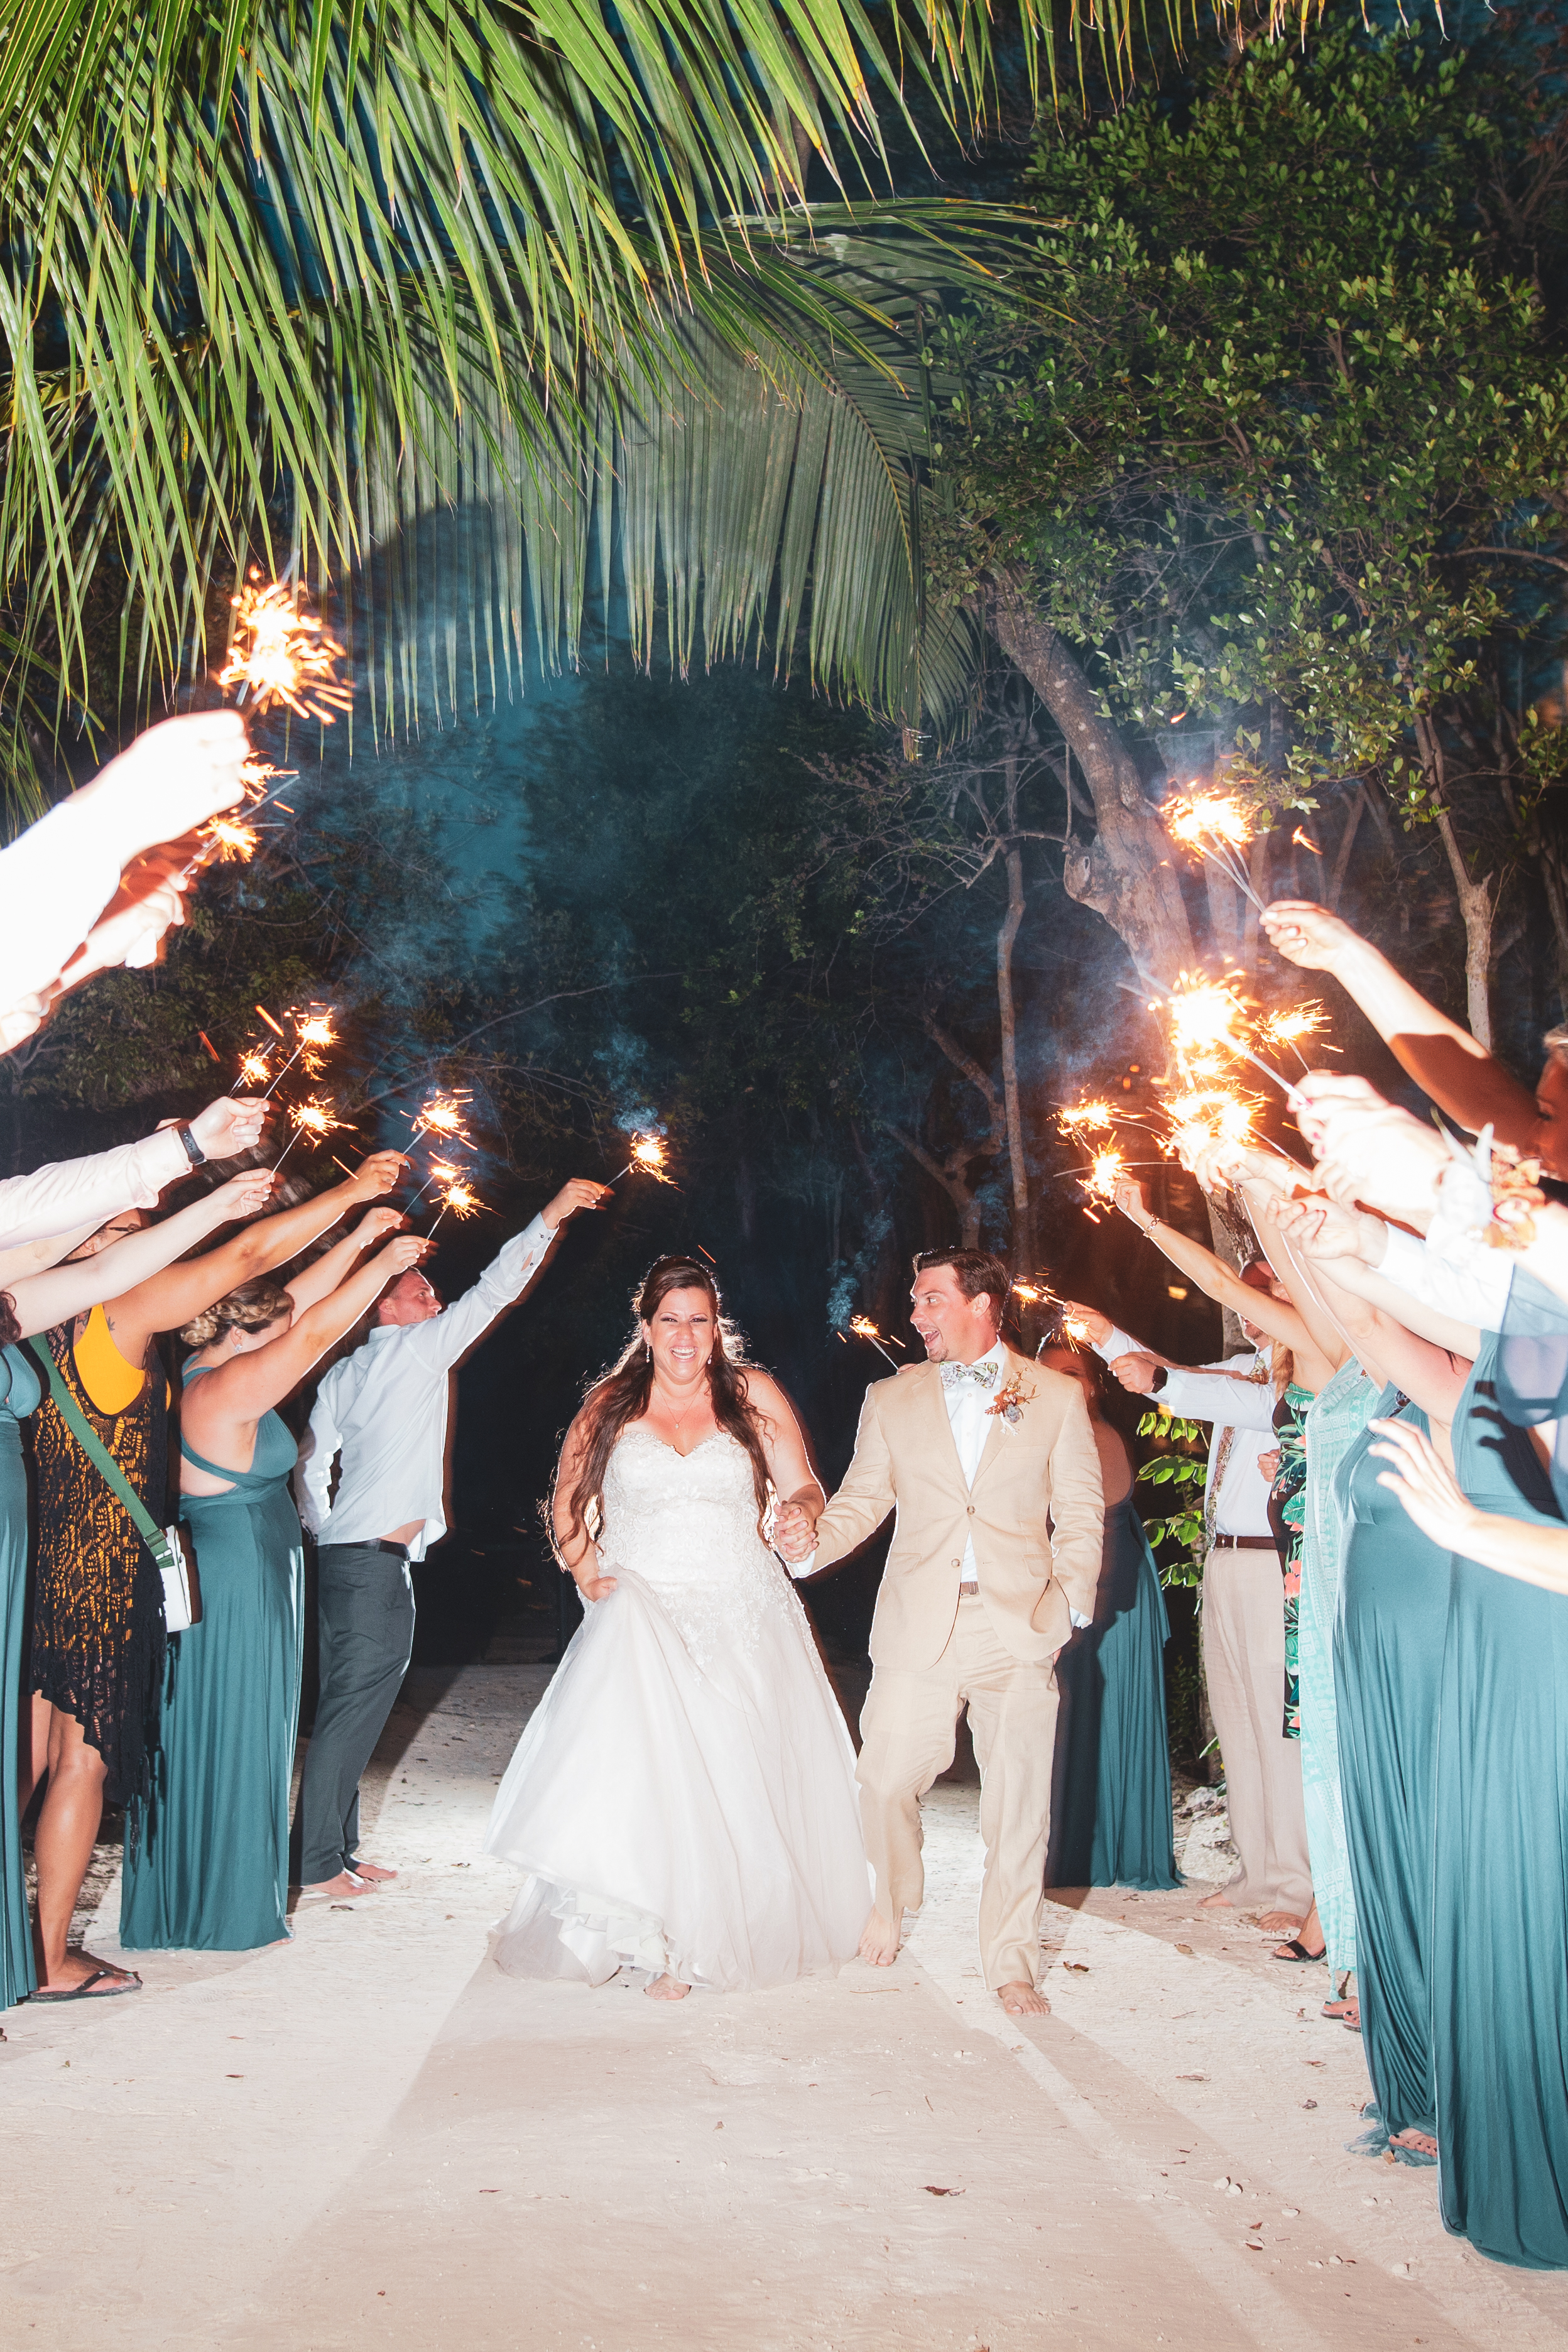 key largo florida beach wedding © kelilina photography 20190316184707-1.jpg